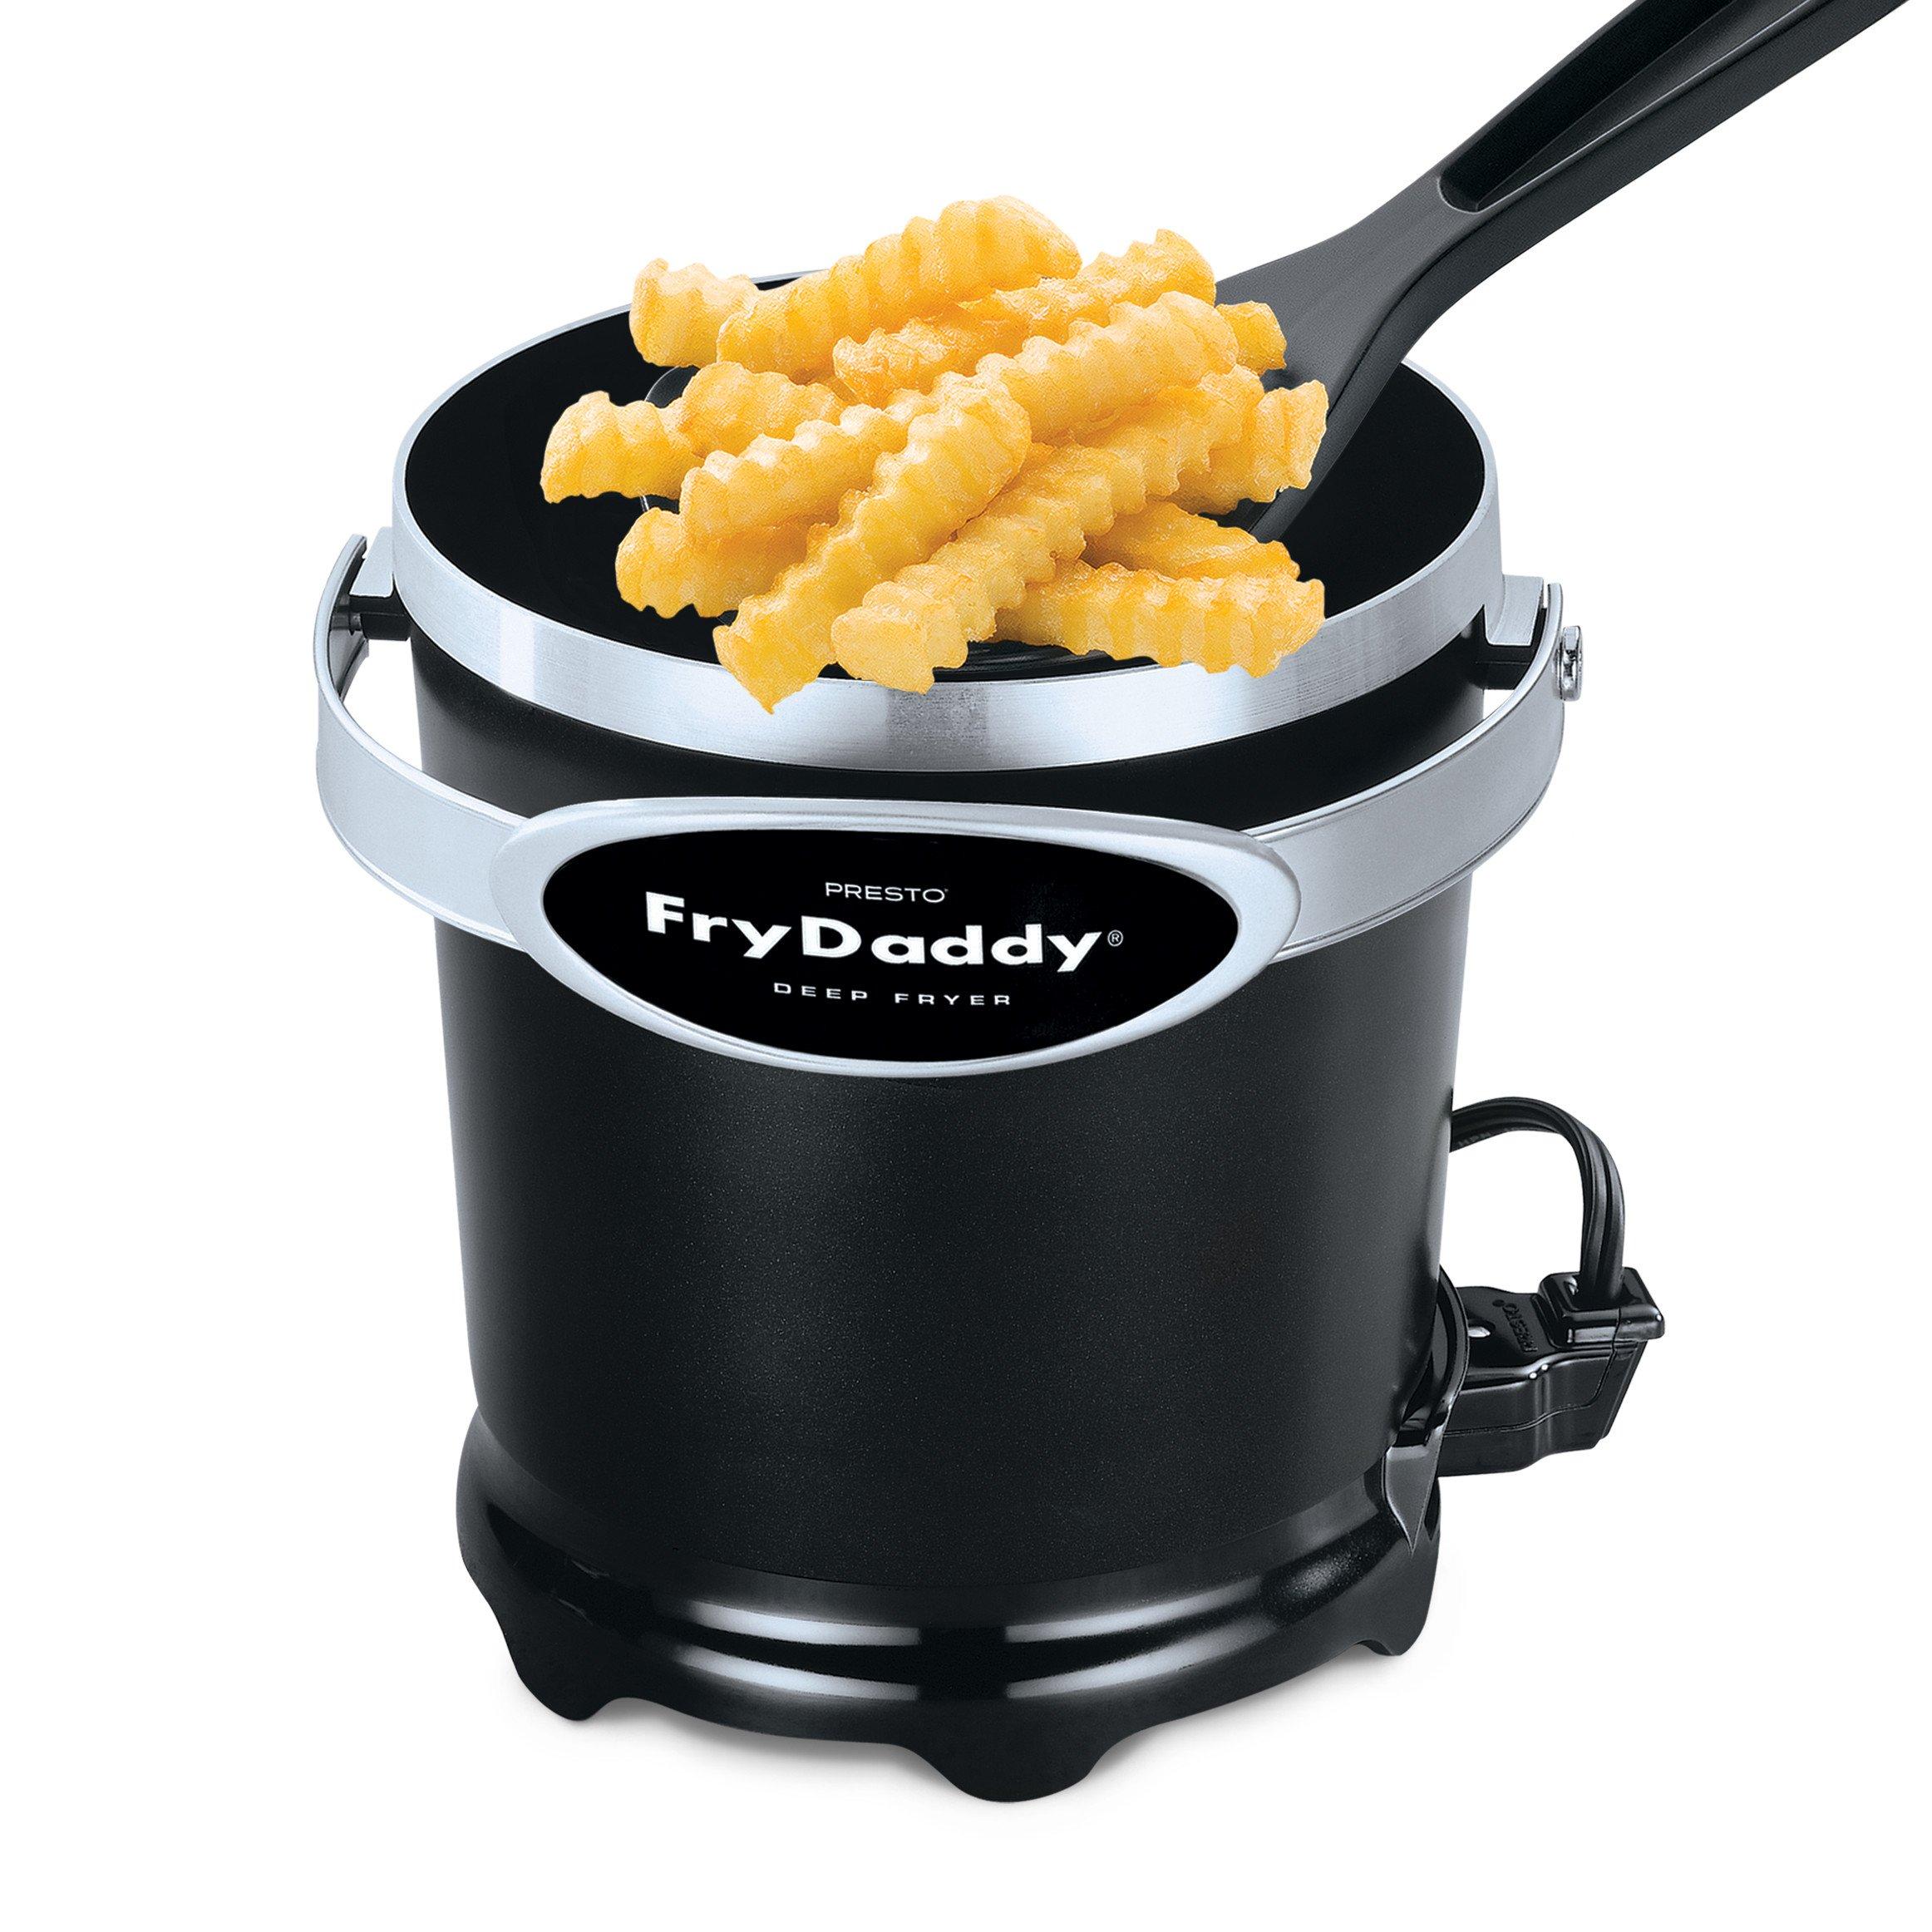 Buy Fry Now!